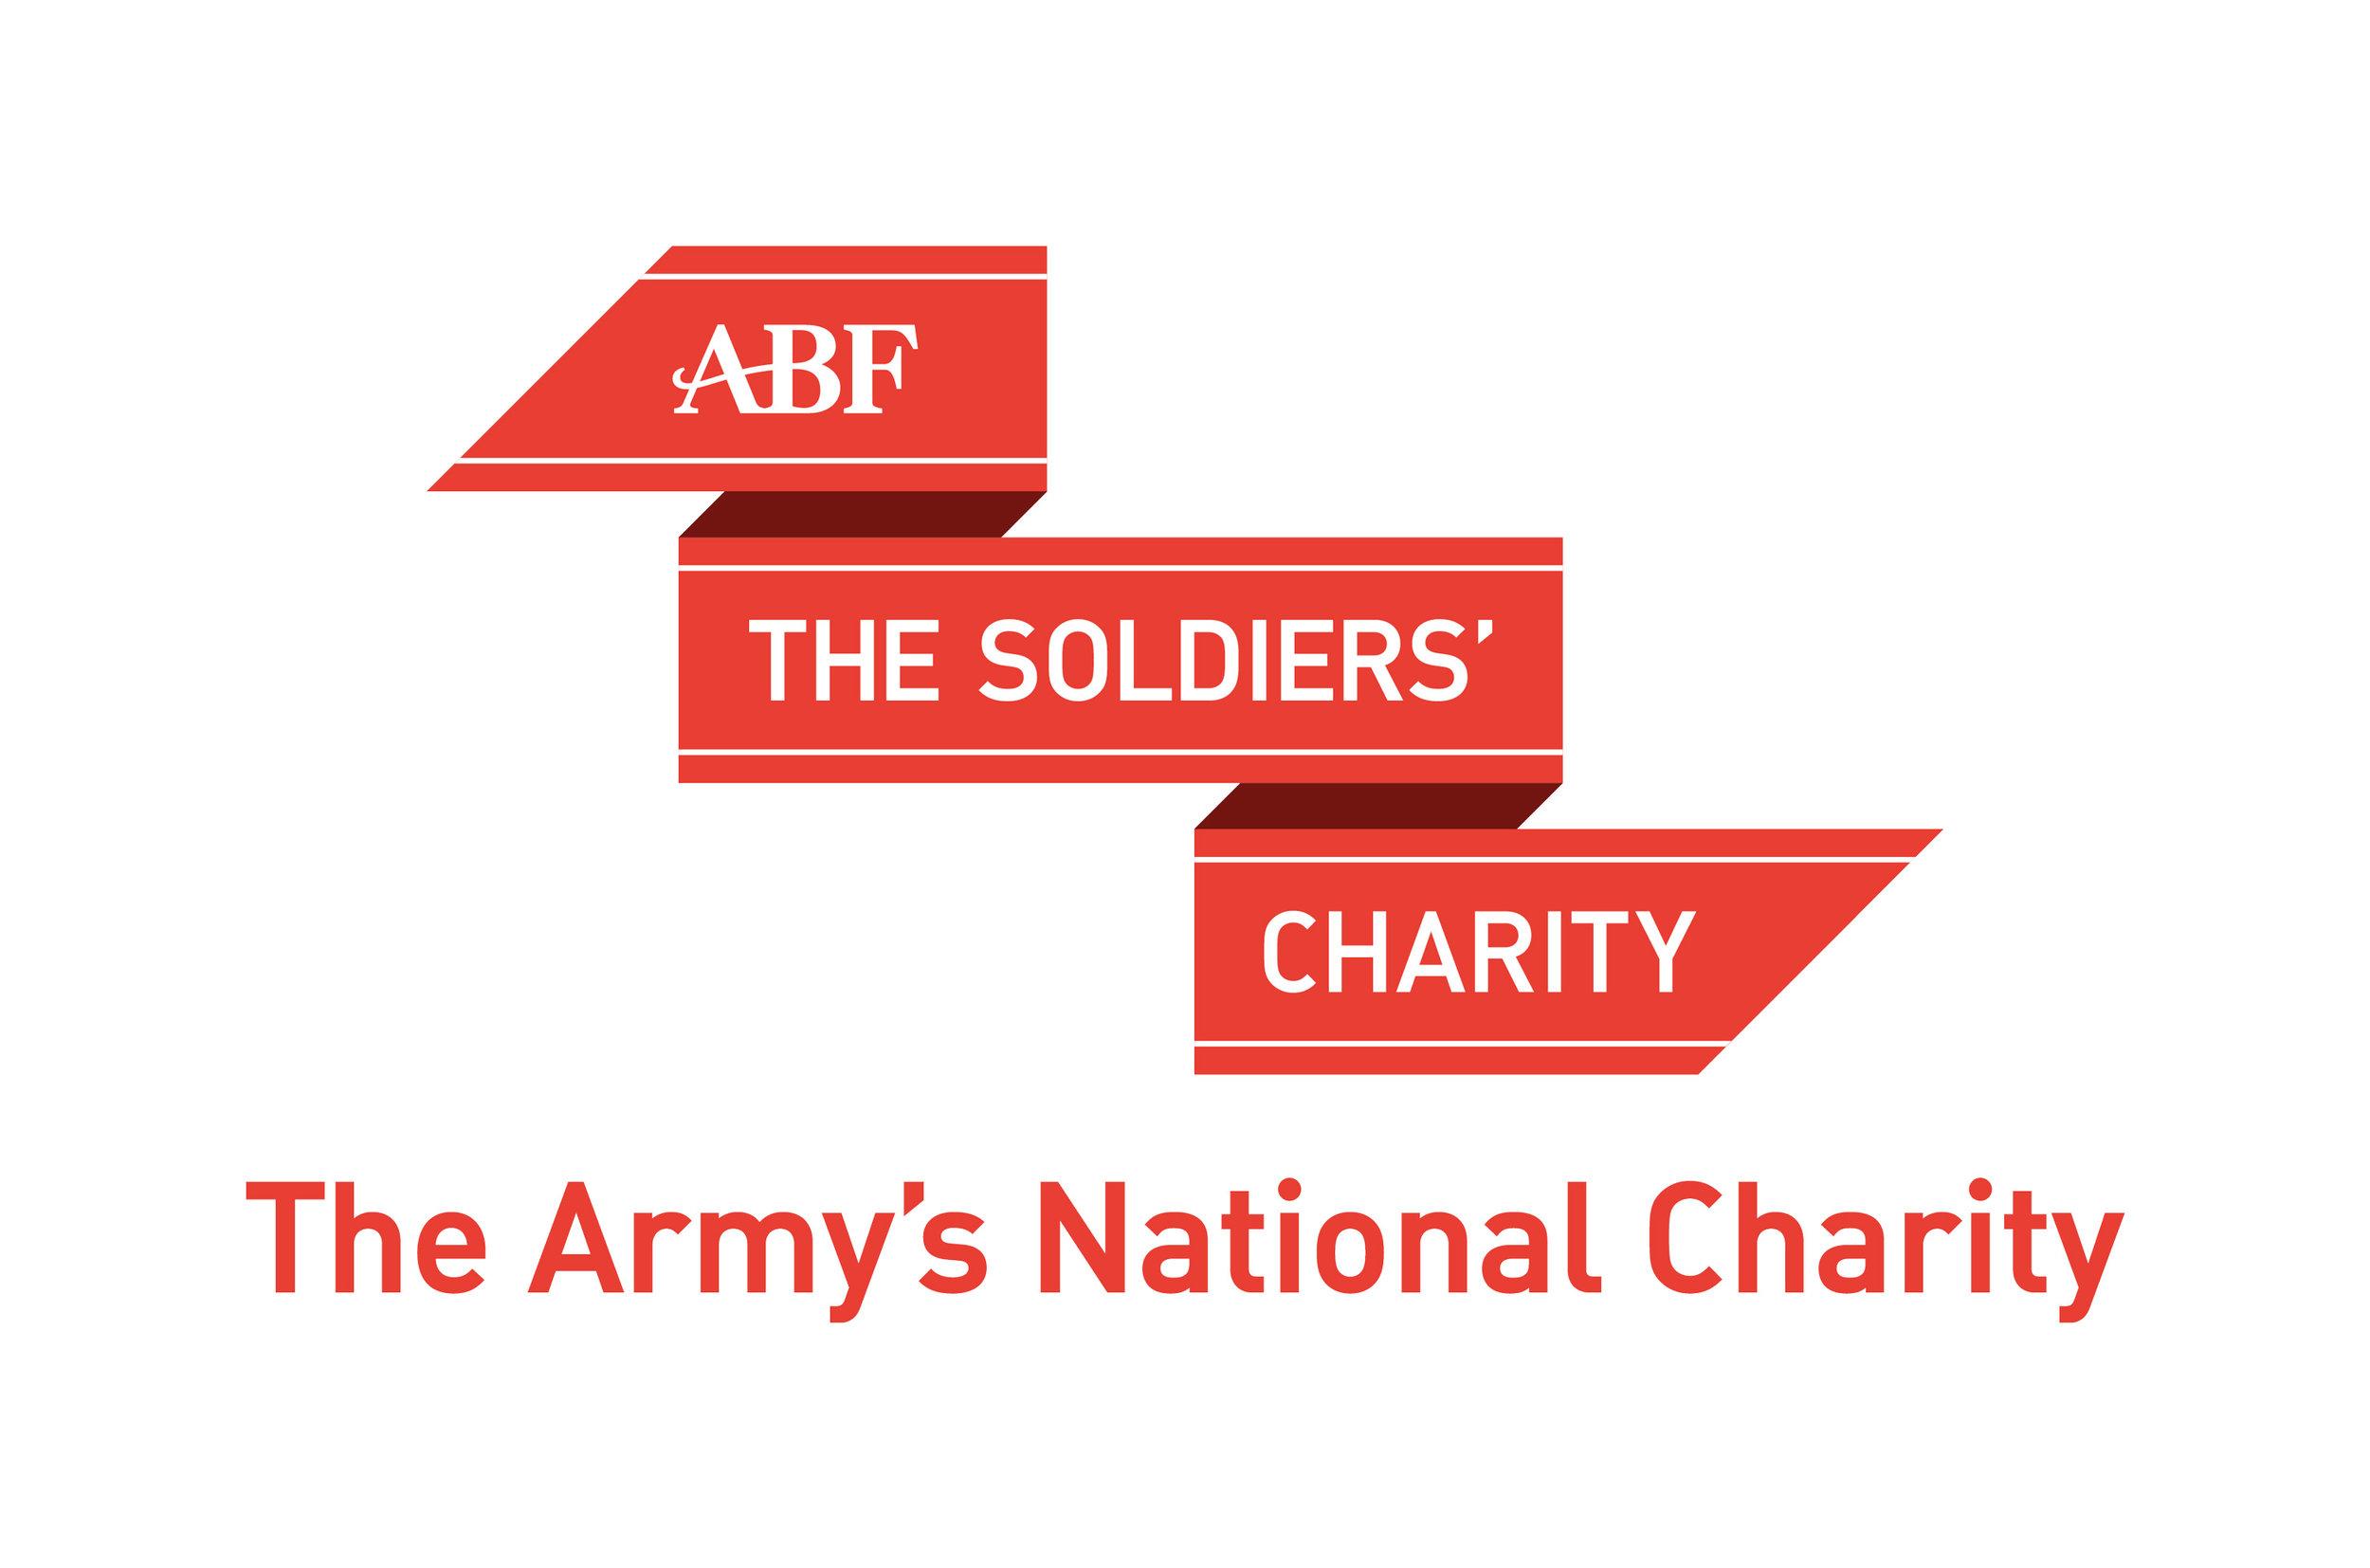 soldiers-charity-logo.jpg